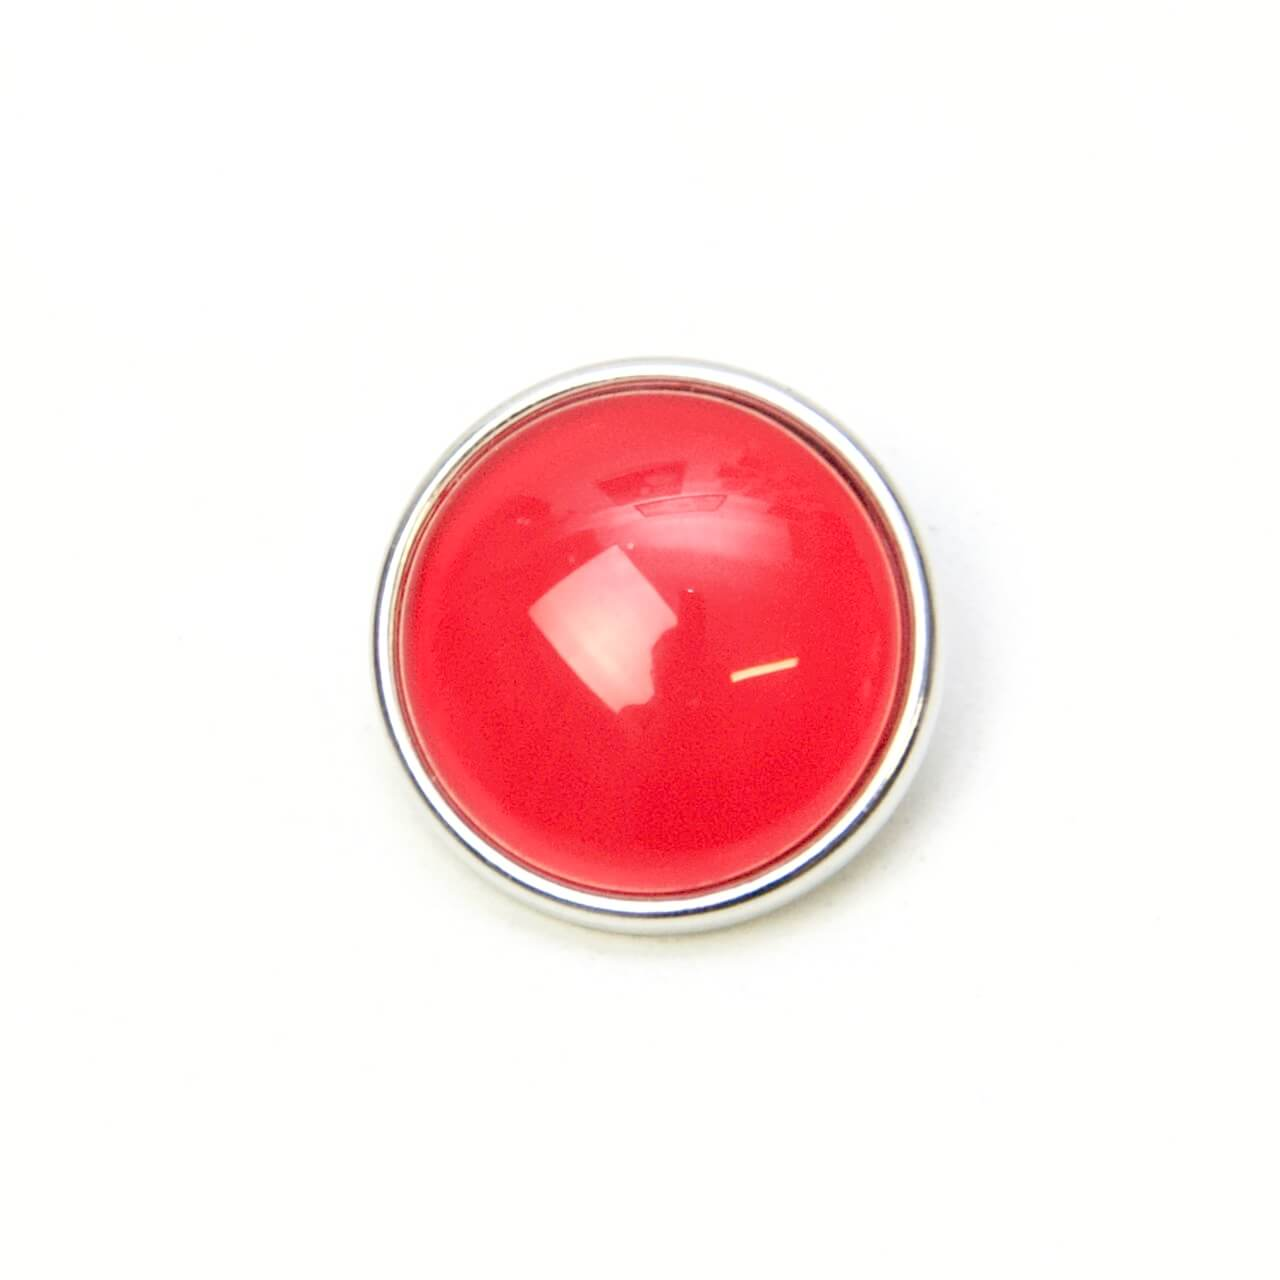 Druckknopf handbemalt in uni Farben Kirsch rot